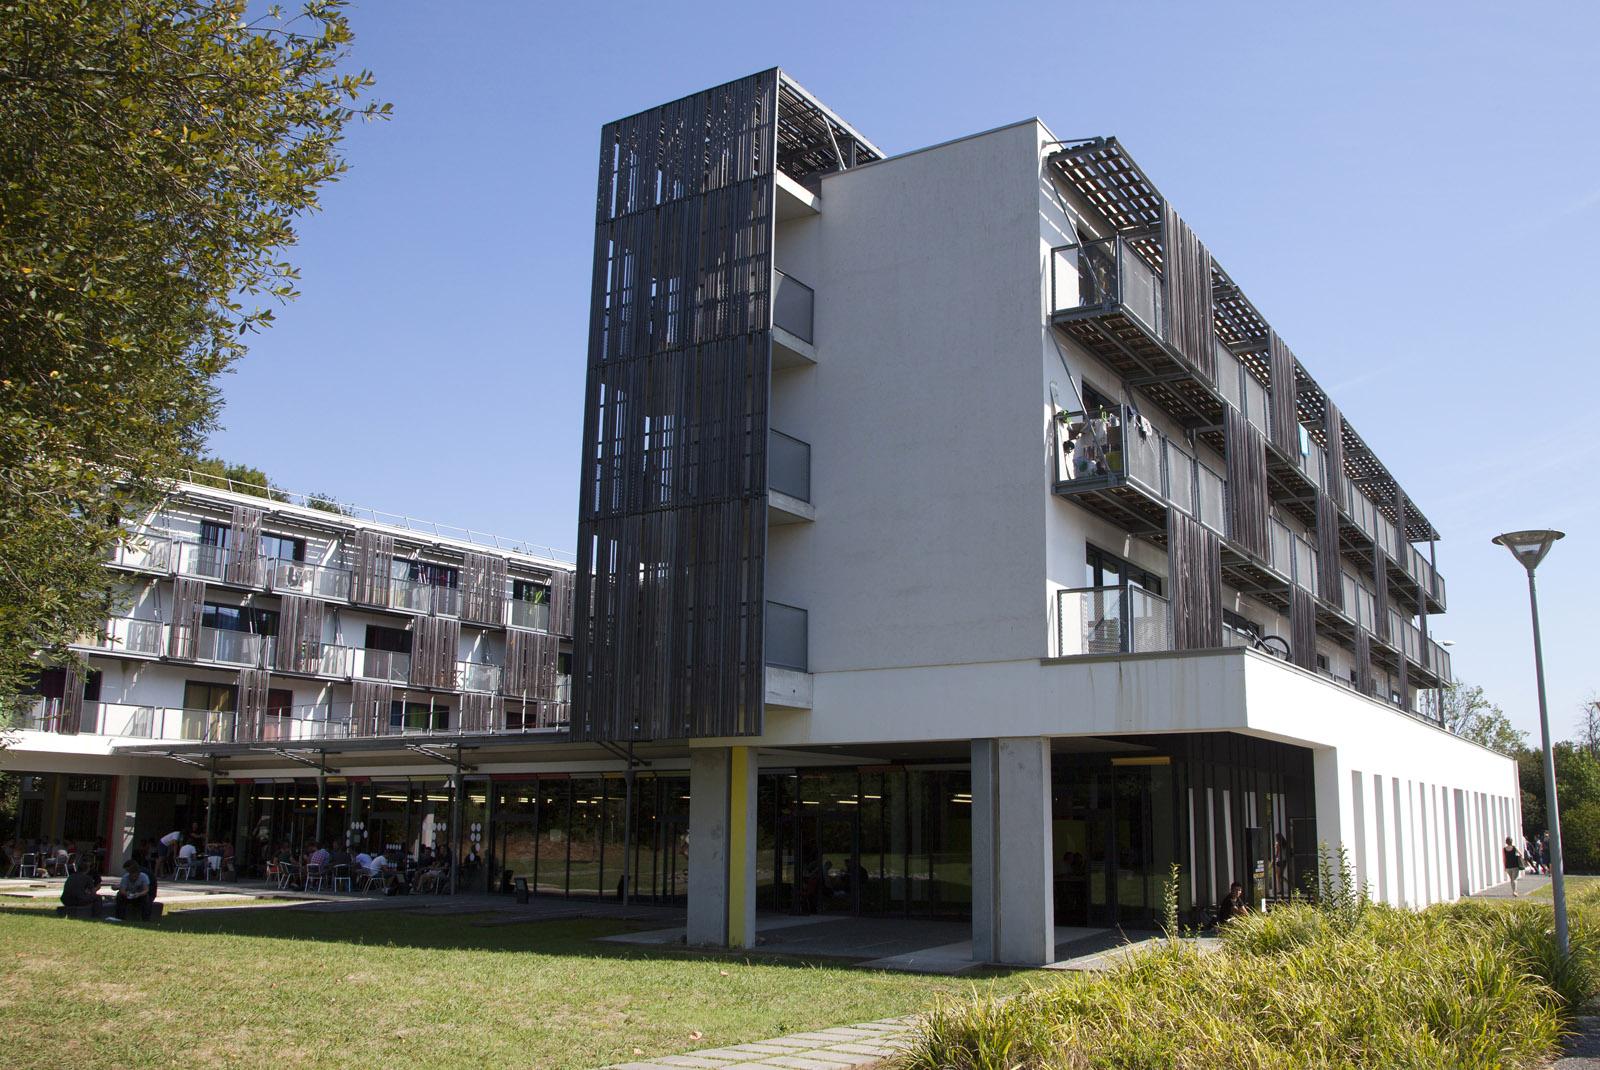 Résidence universitaire Pierre Bidart - Arkinova